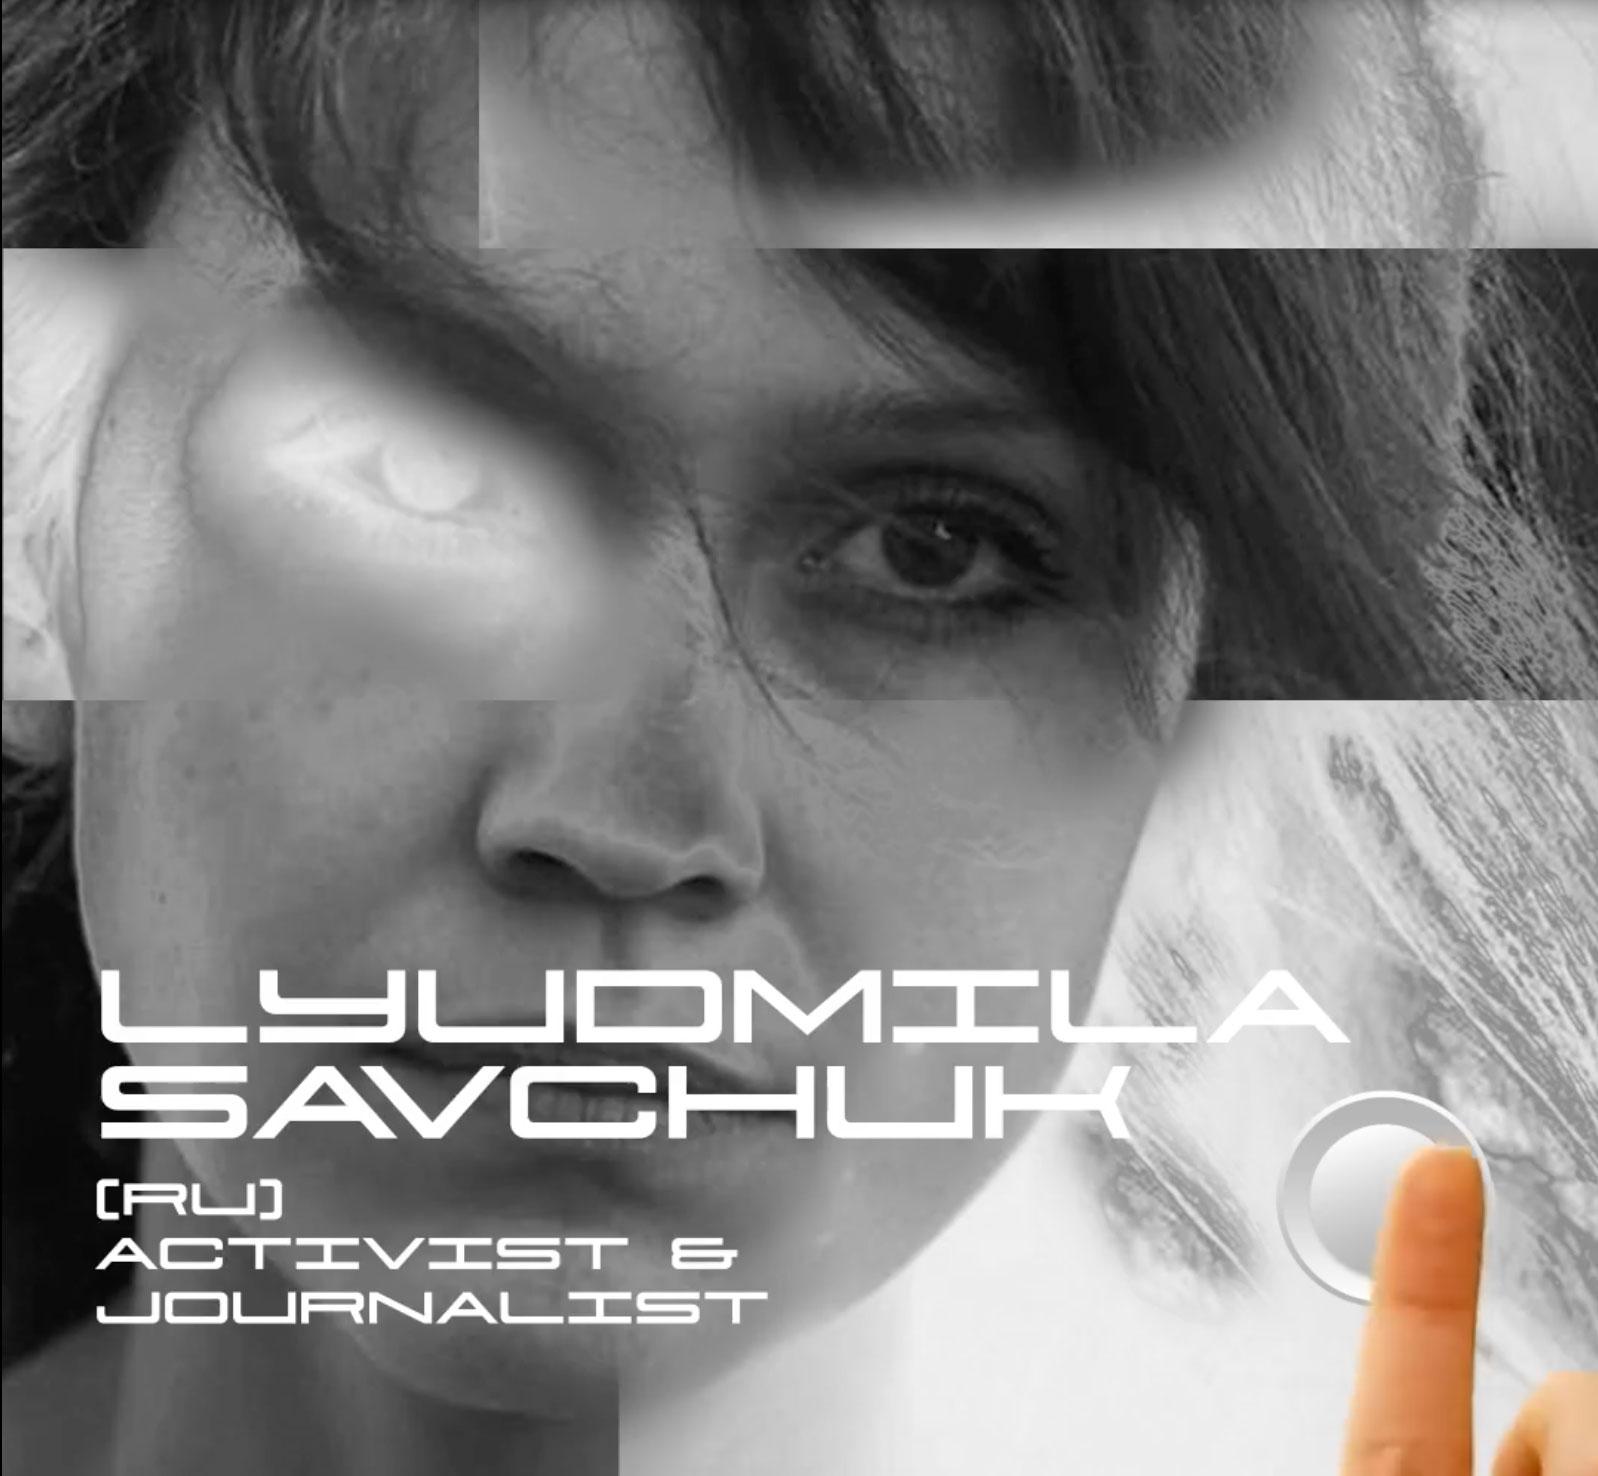 Lyudmilla.jpg